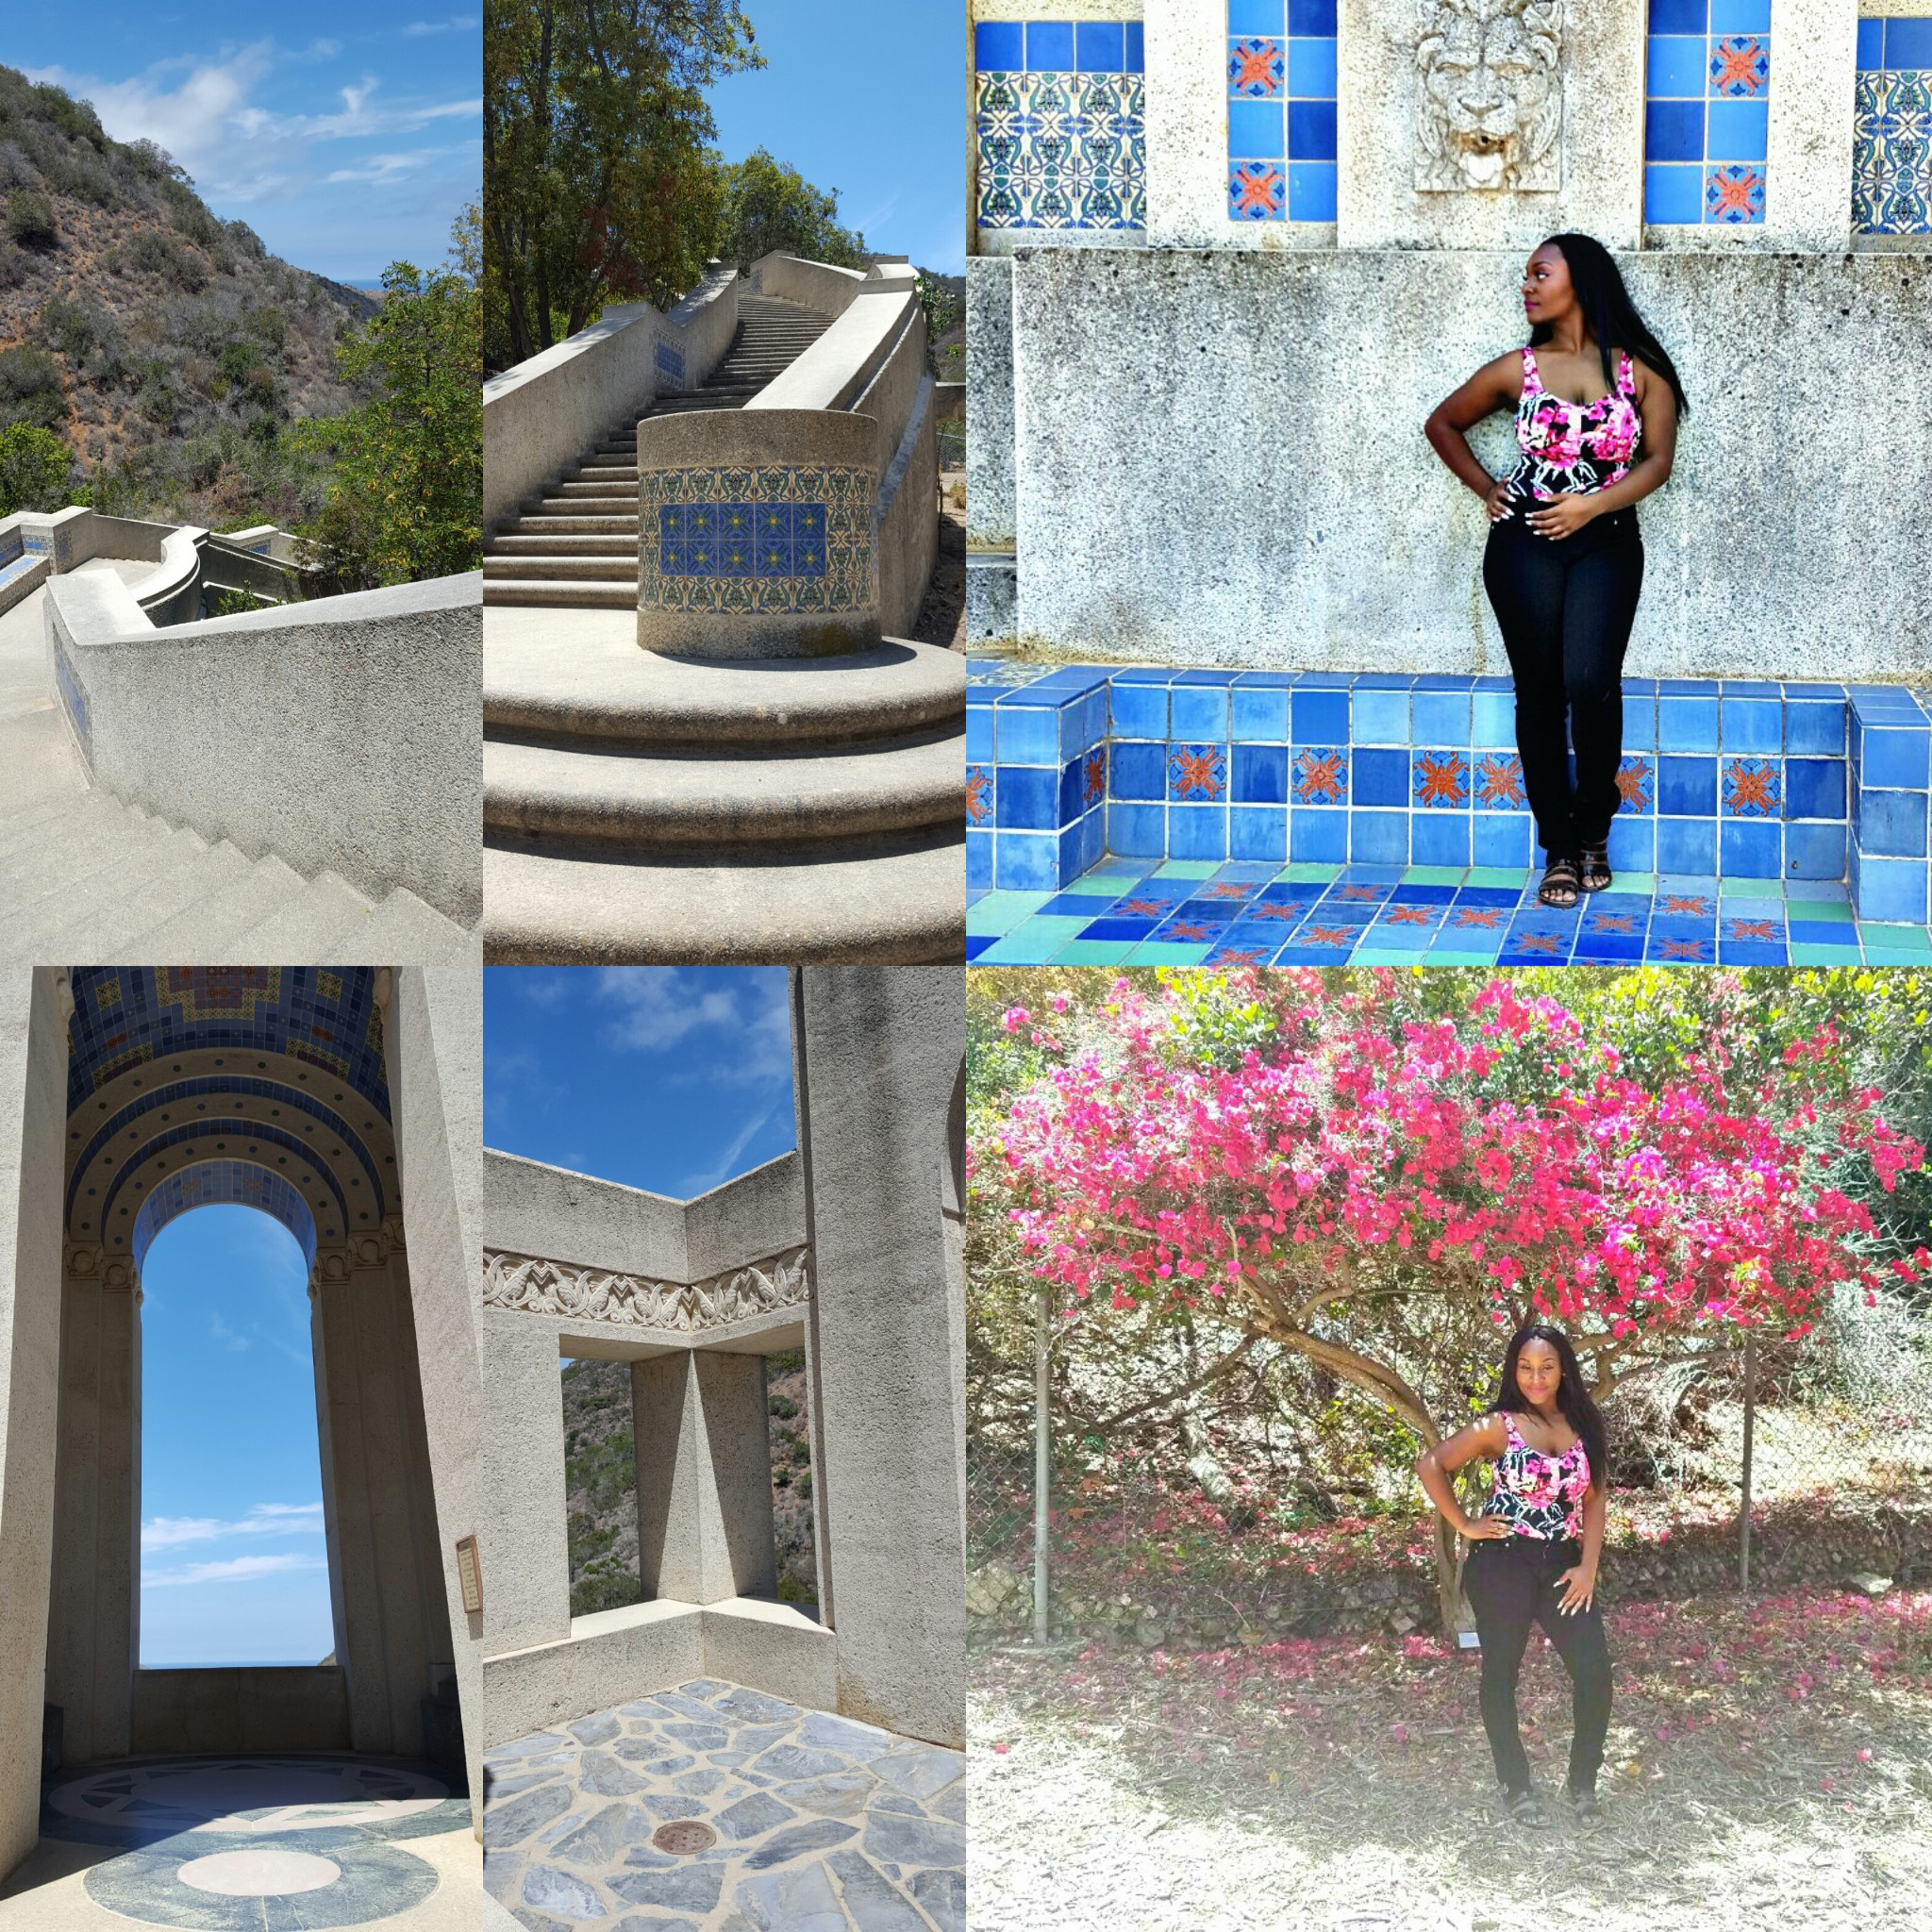 Wrigley Botanical Garden, Catalina Island CA